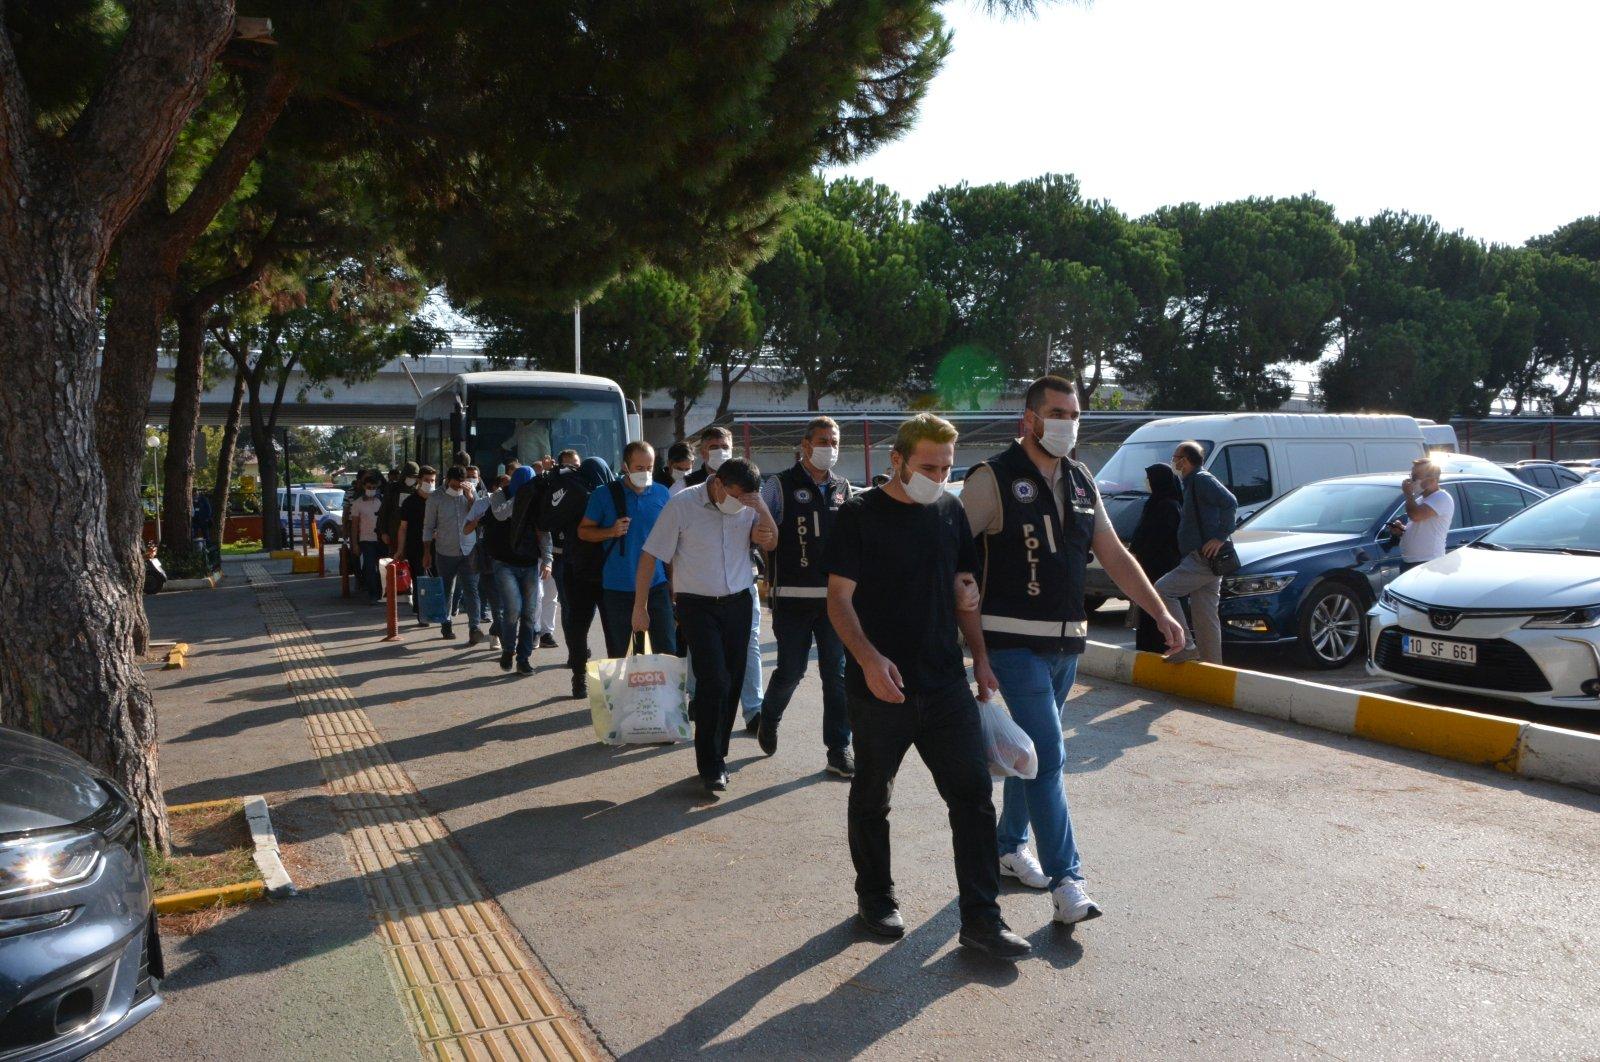 Police escort FETÖ suspects to the courthouse, in Balıkesir, western Turkey, Sept. 22, 2020. (AA Photo)